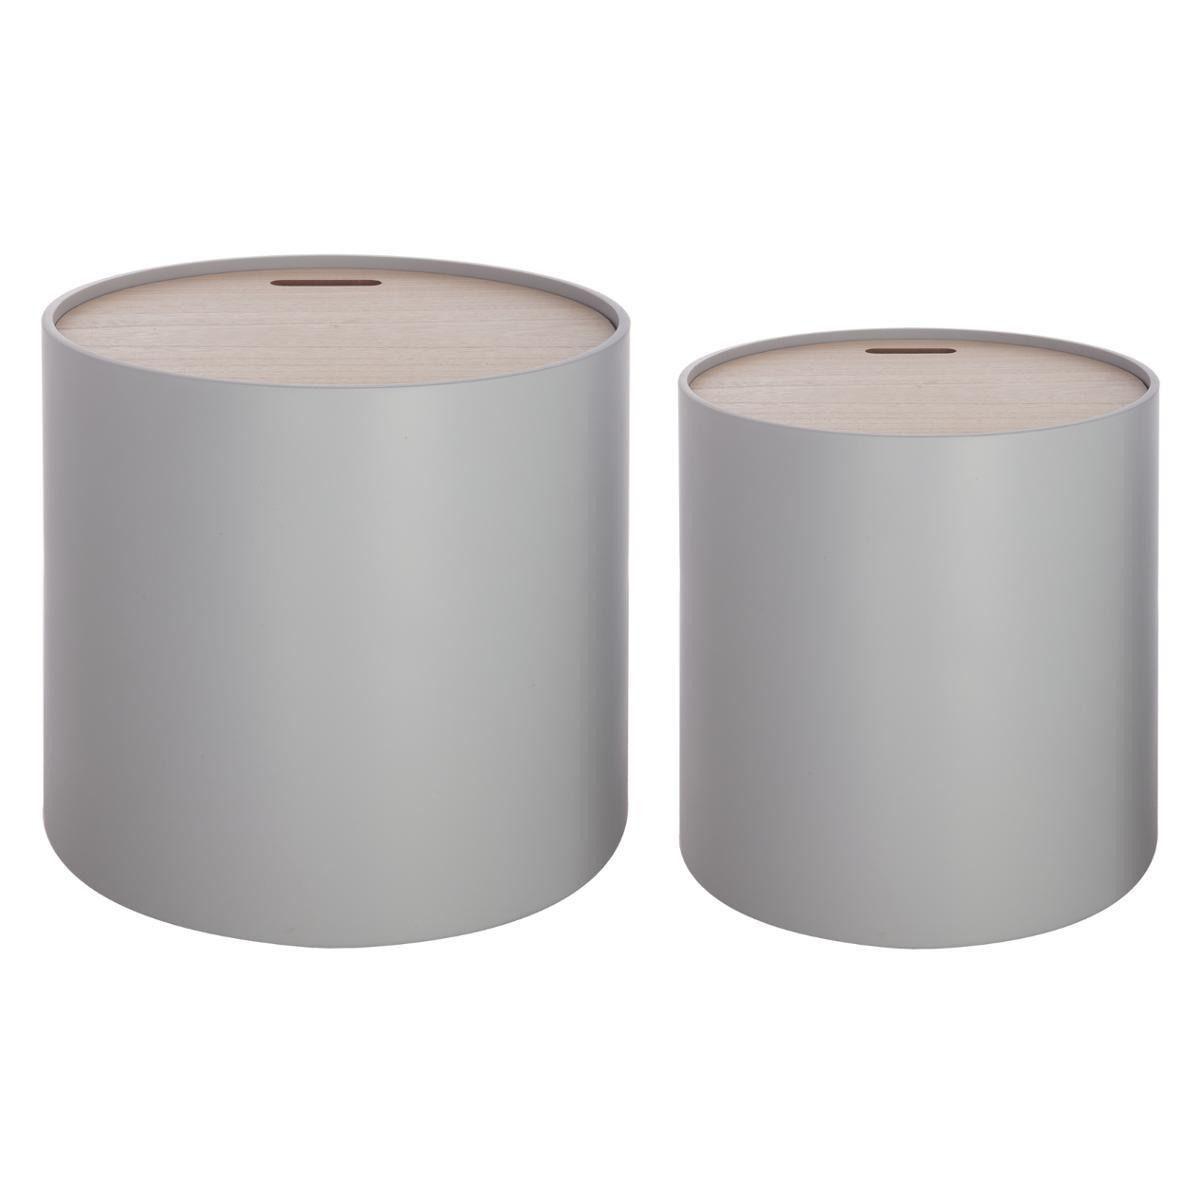 atmosphera crateur dintrieur organizr box kulat box ndoba stolek grey 2v1 2 ks barva ed